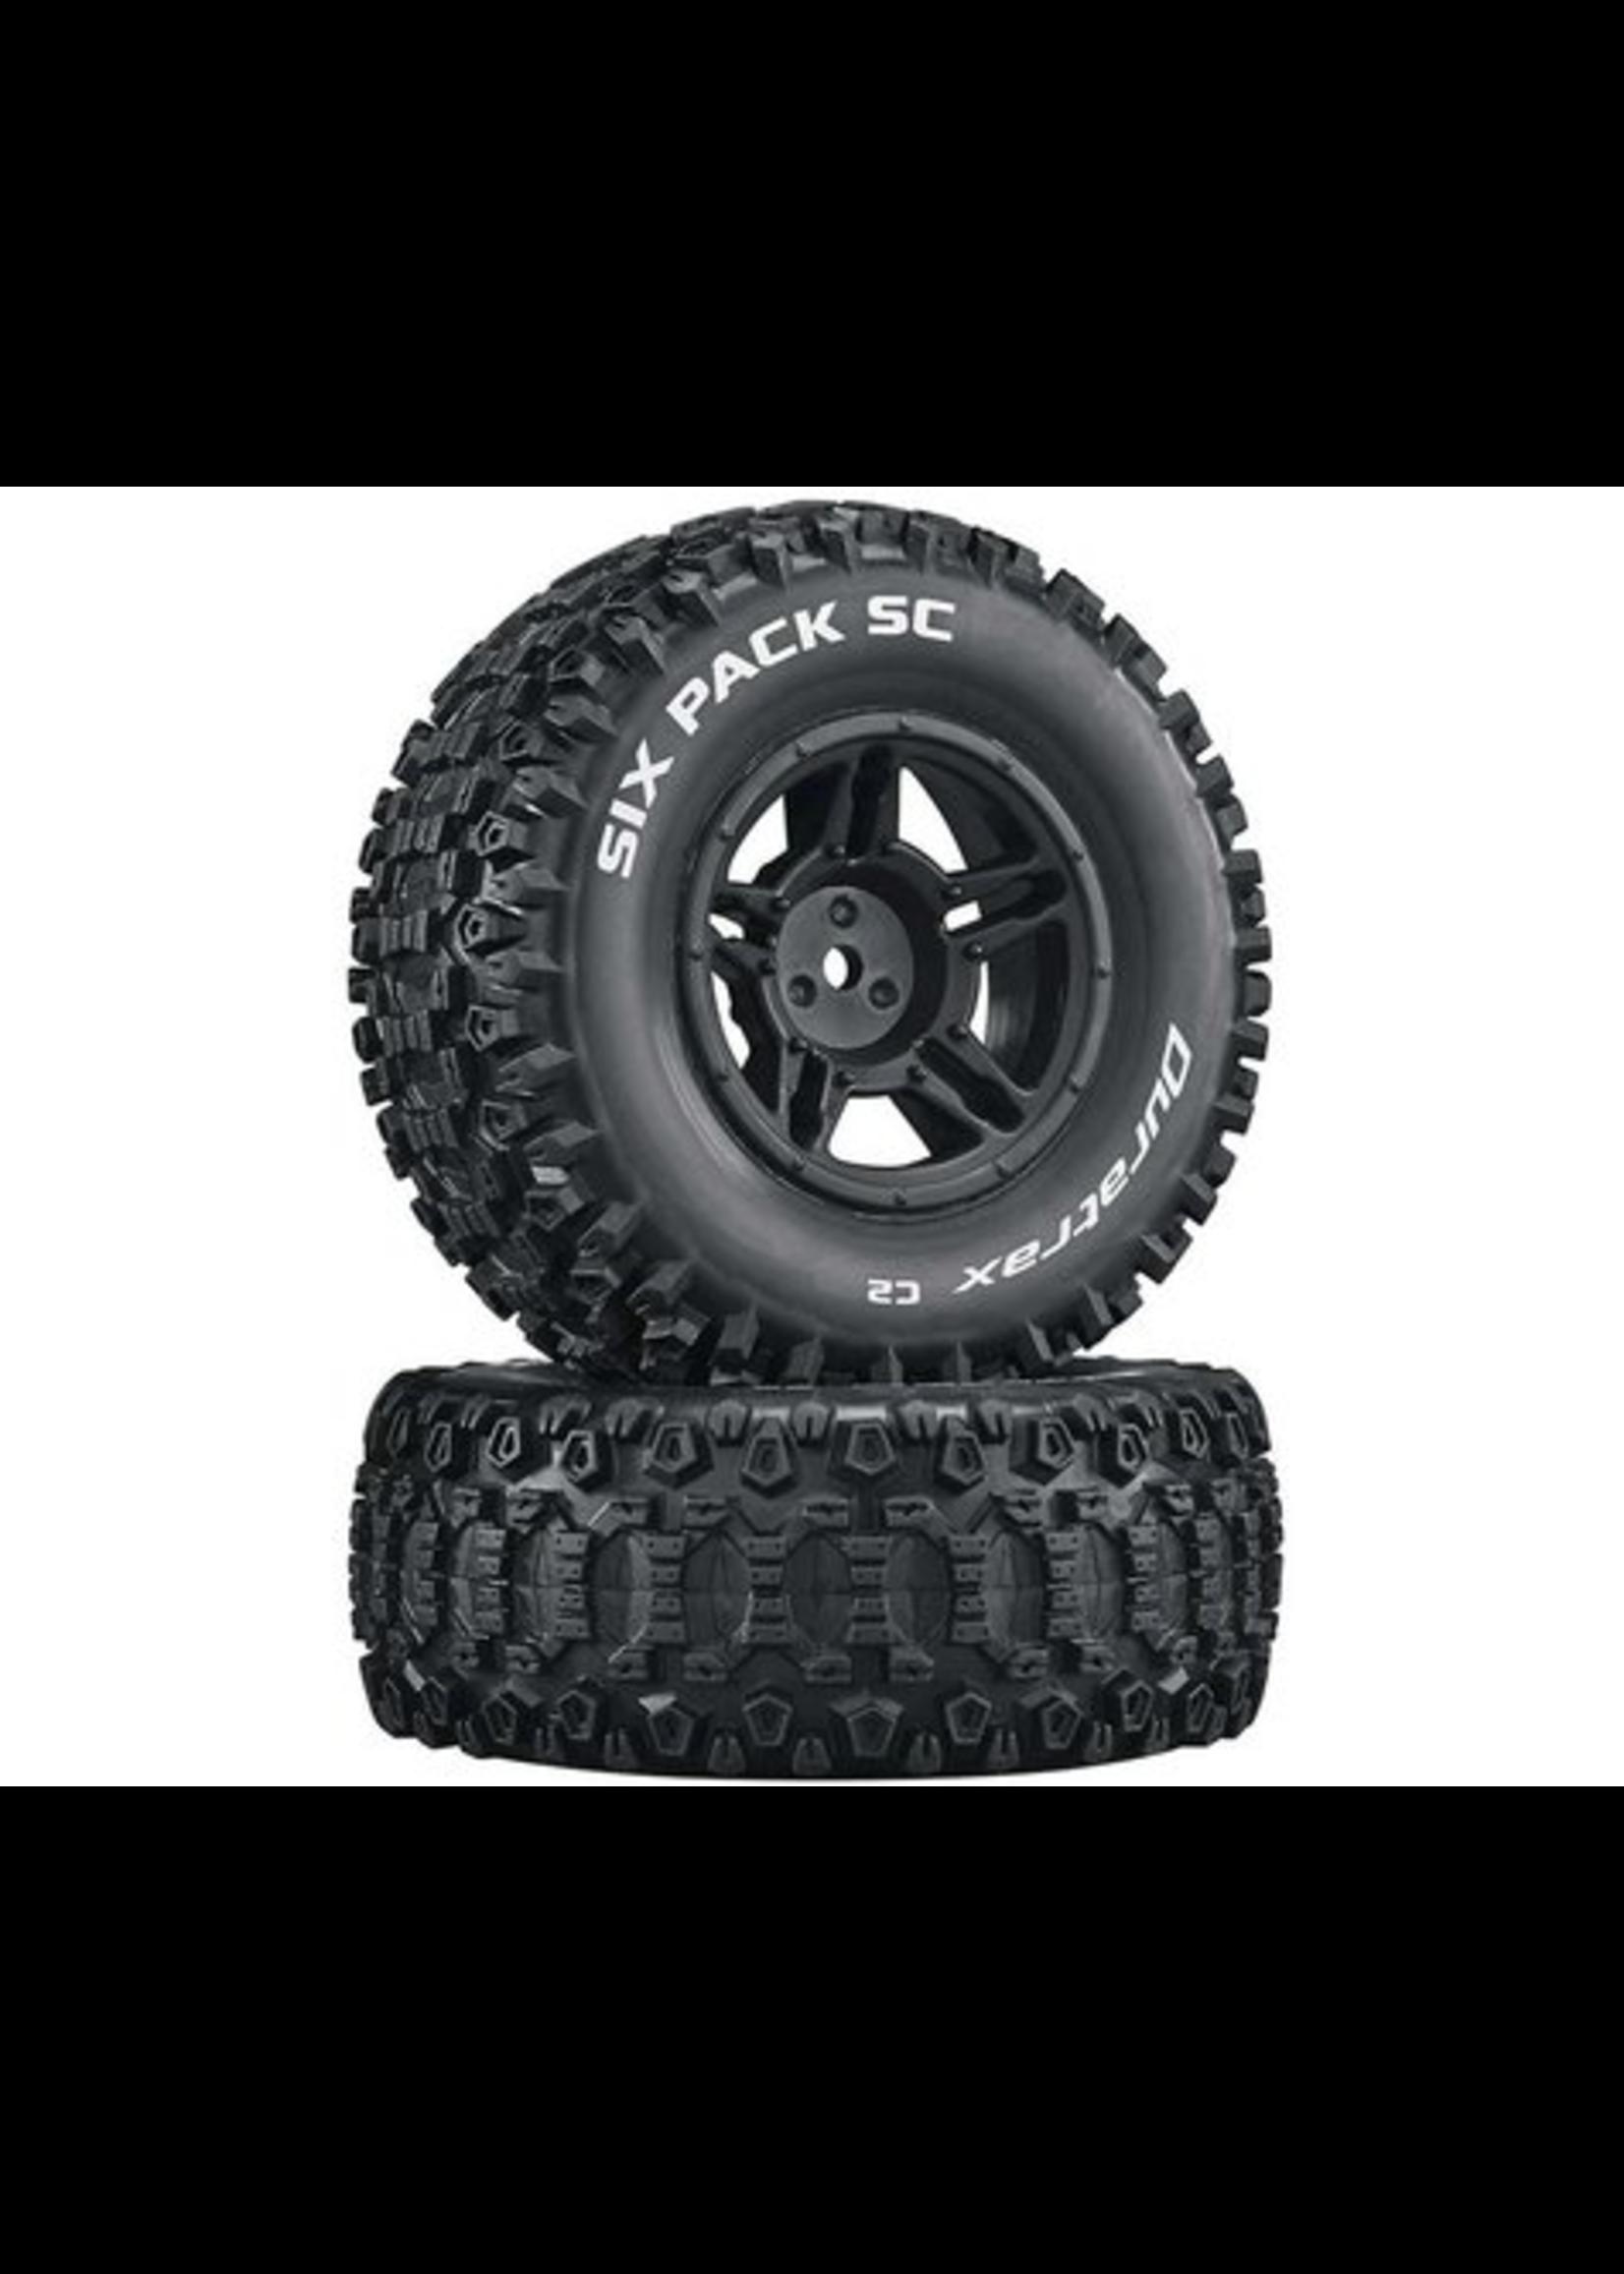 Duratrax DTXC3861 Duratrax Six-Pack SC C2 Mounted Tires: Slash 4x4 Blitz Front Rear (2)